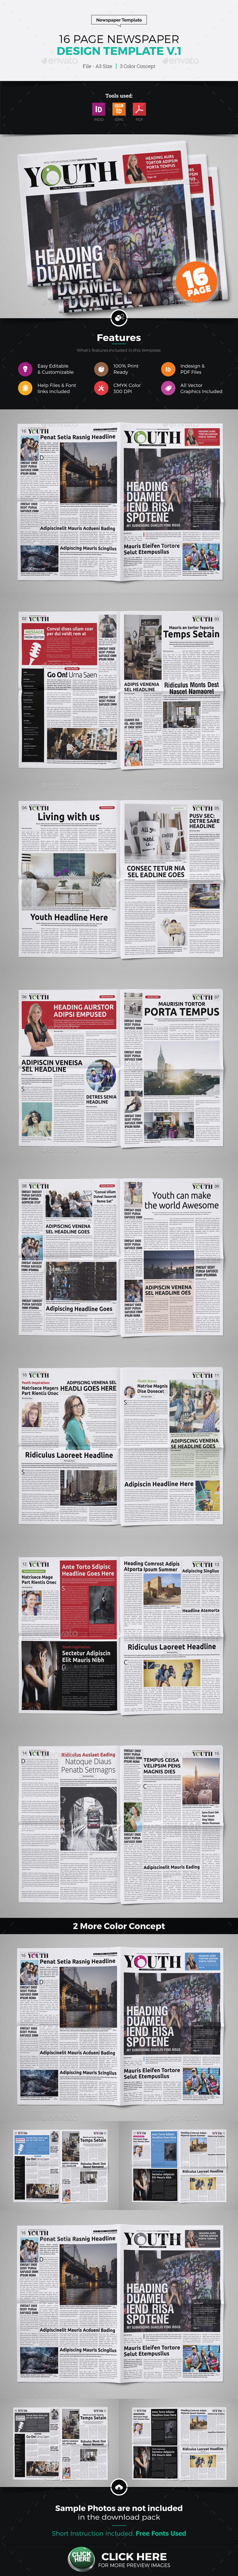 16 Page Newspaper Design v1 - Newsletters Print Templates